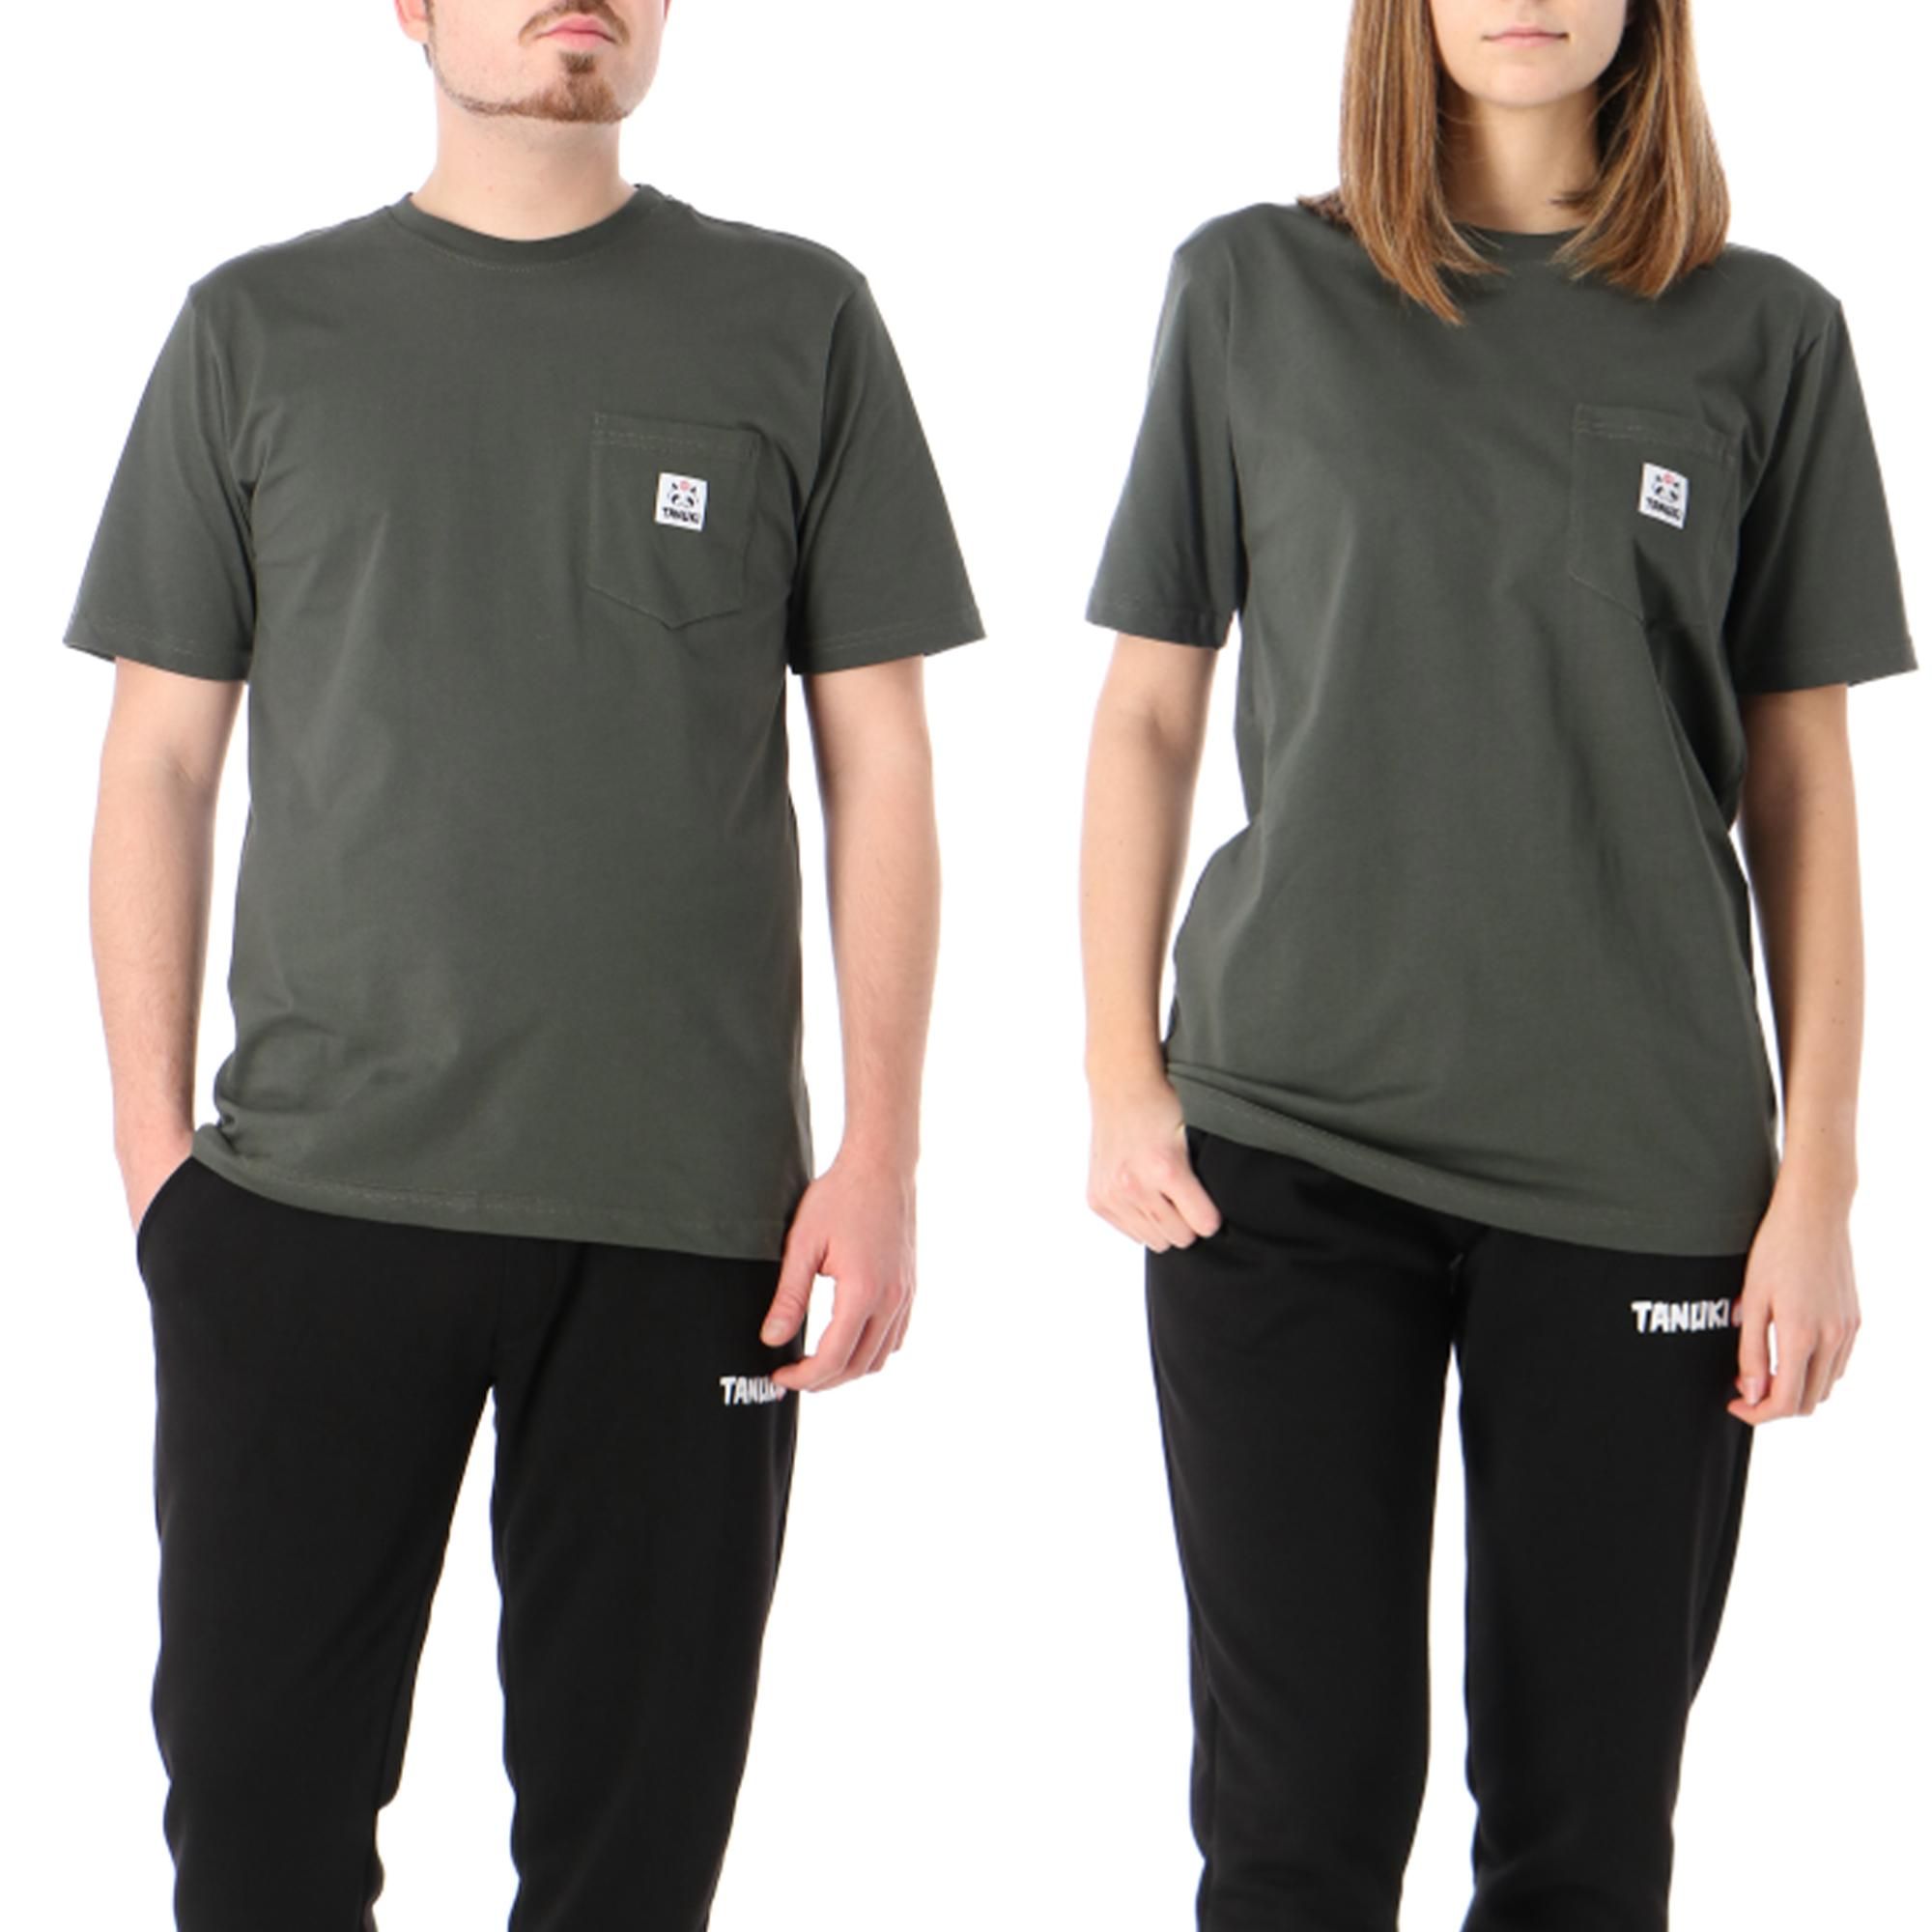 Tanuki Pocket Label Tee Green military